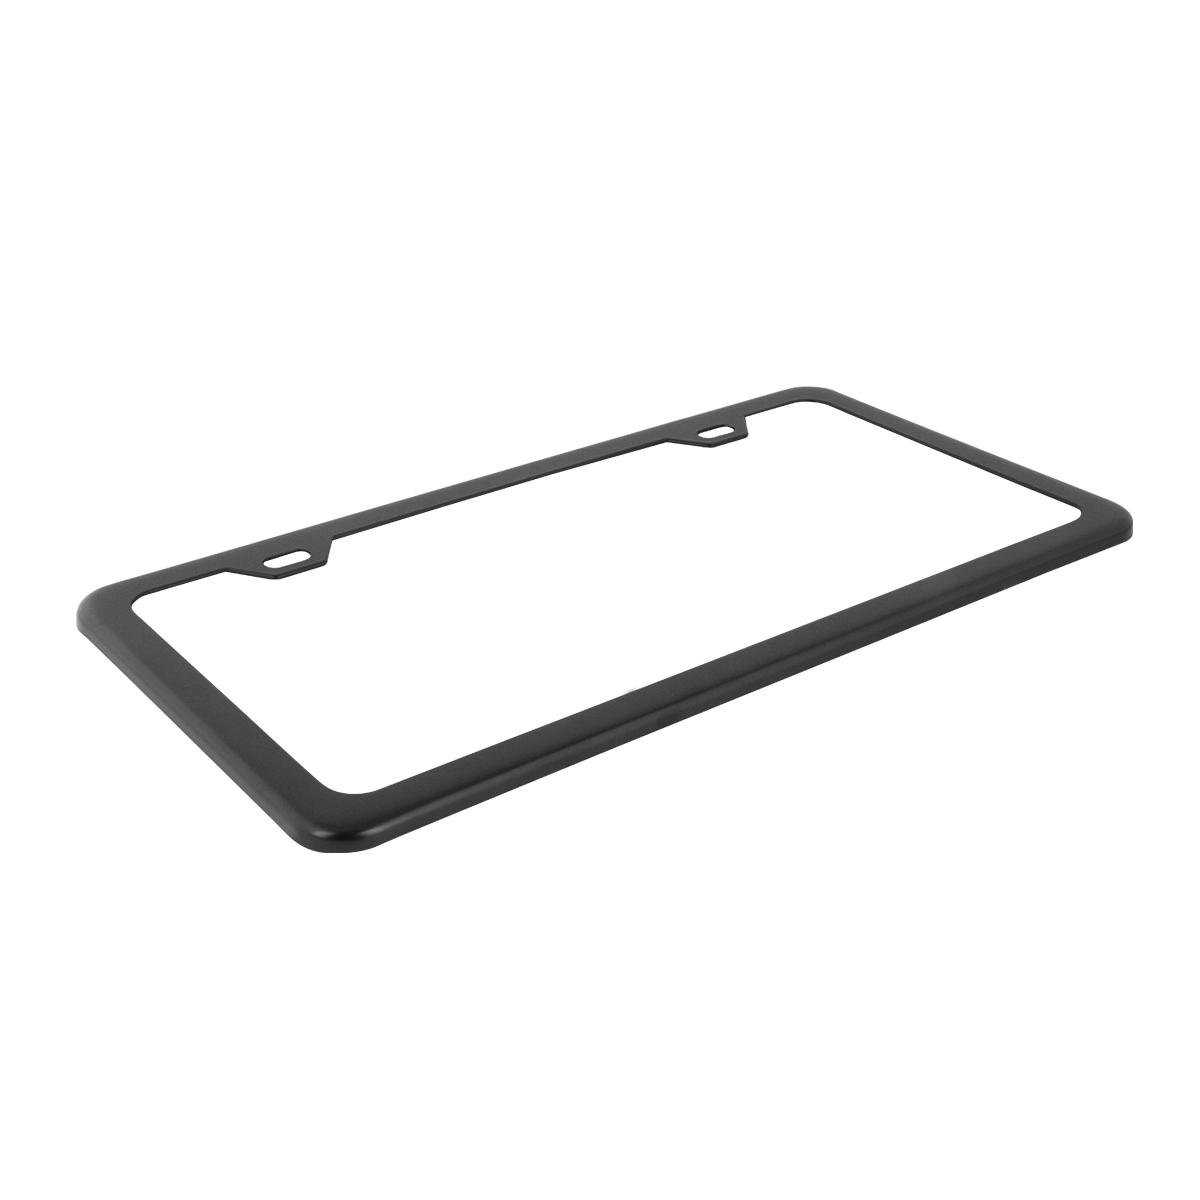 60402 Plain Matte Black 2 Hole License Plate Frame - Top View